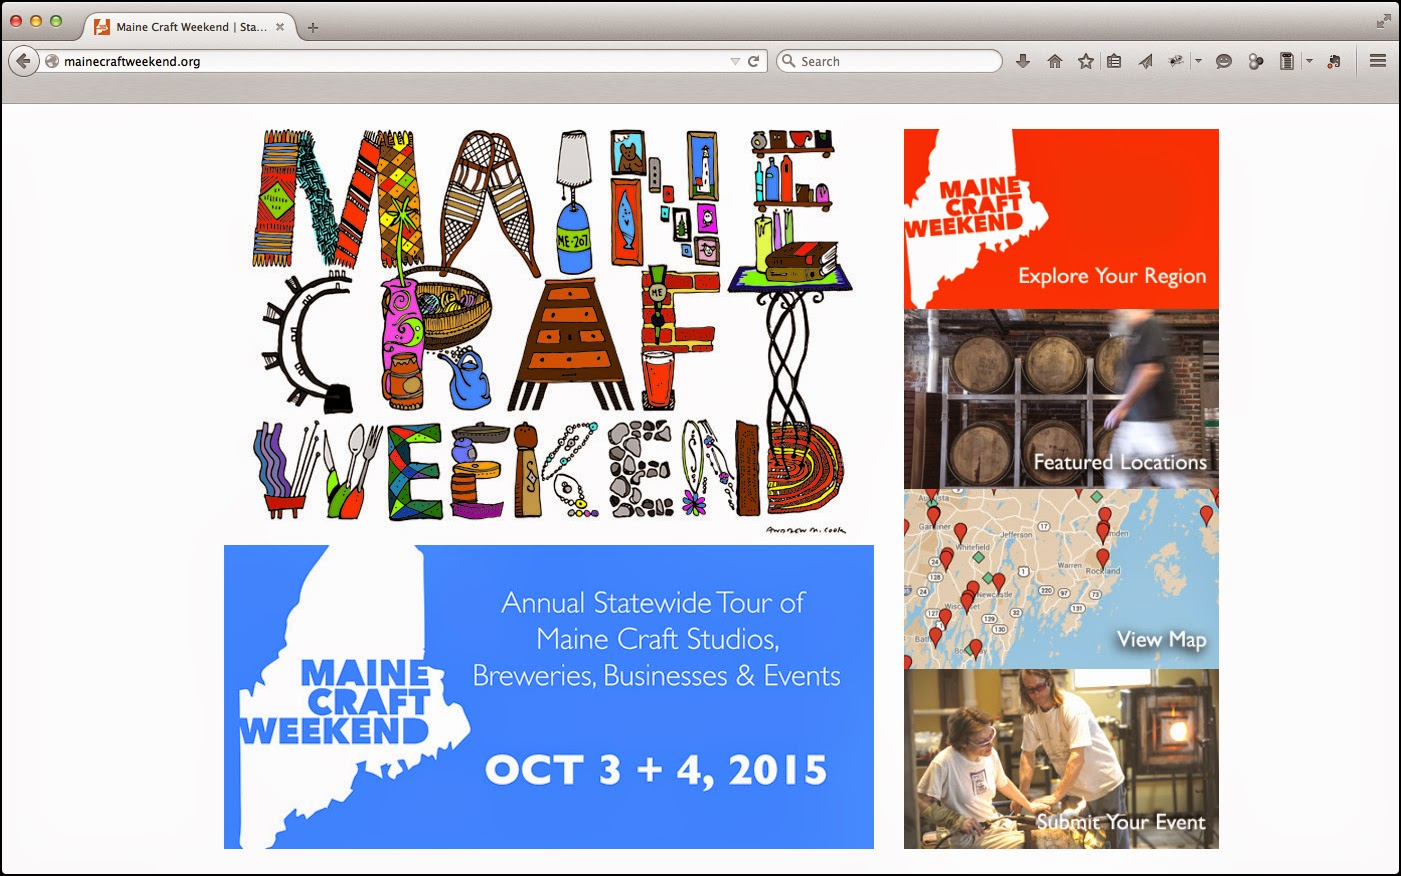 American Craft Week: Maine Craft Weekend's DEDICATED EVENT